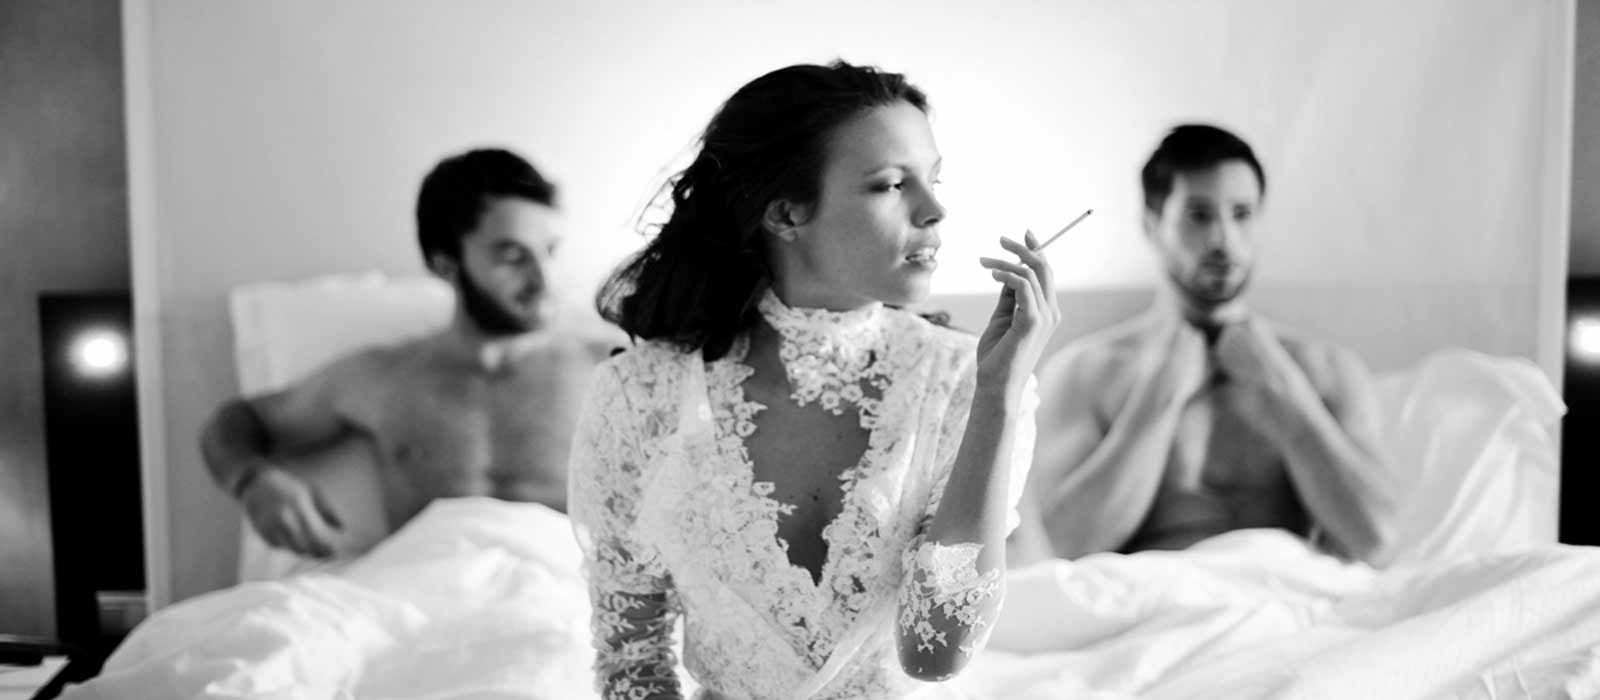 photographe pour mariage book mode jean charles rey. Black Bedroom Furniture Sets. Home Design Ideas